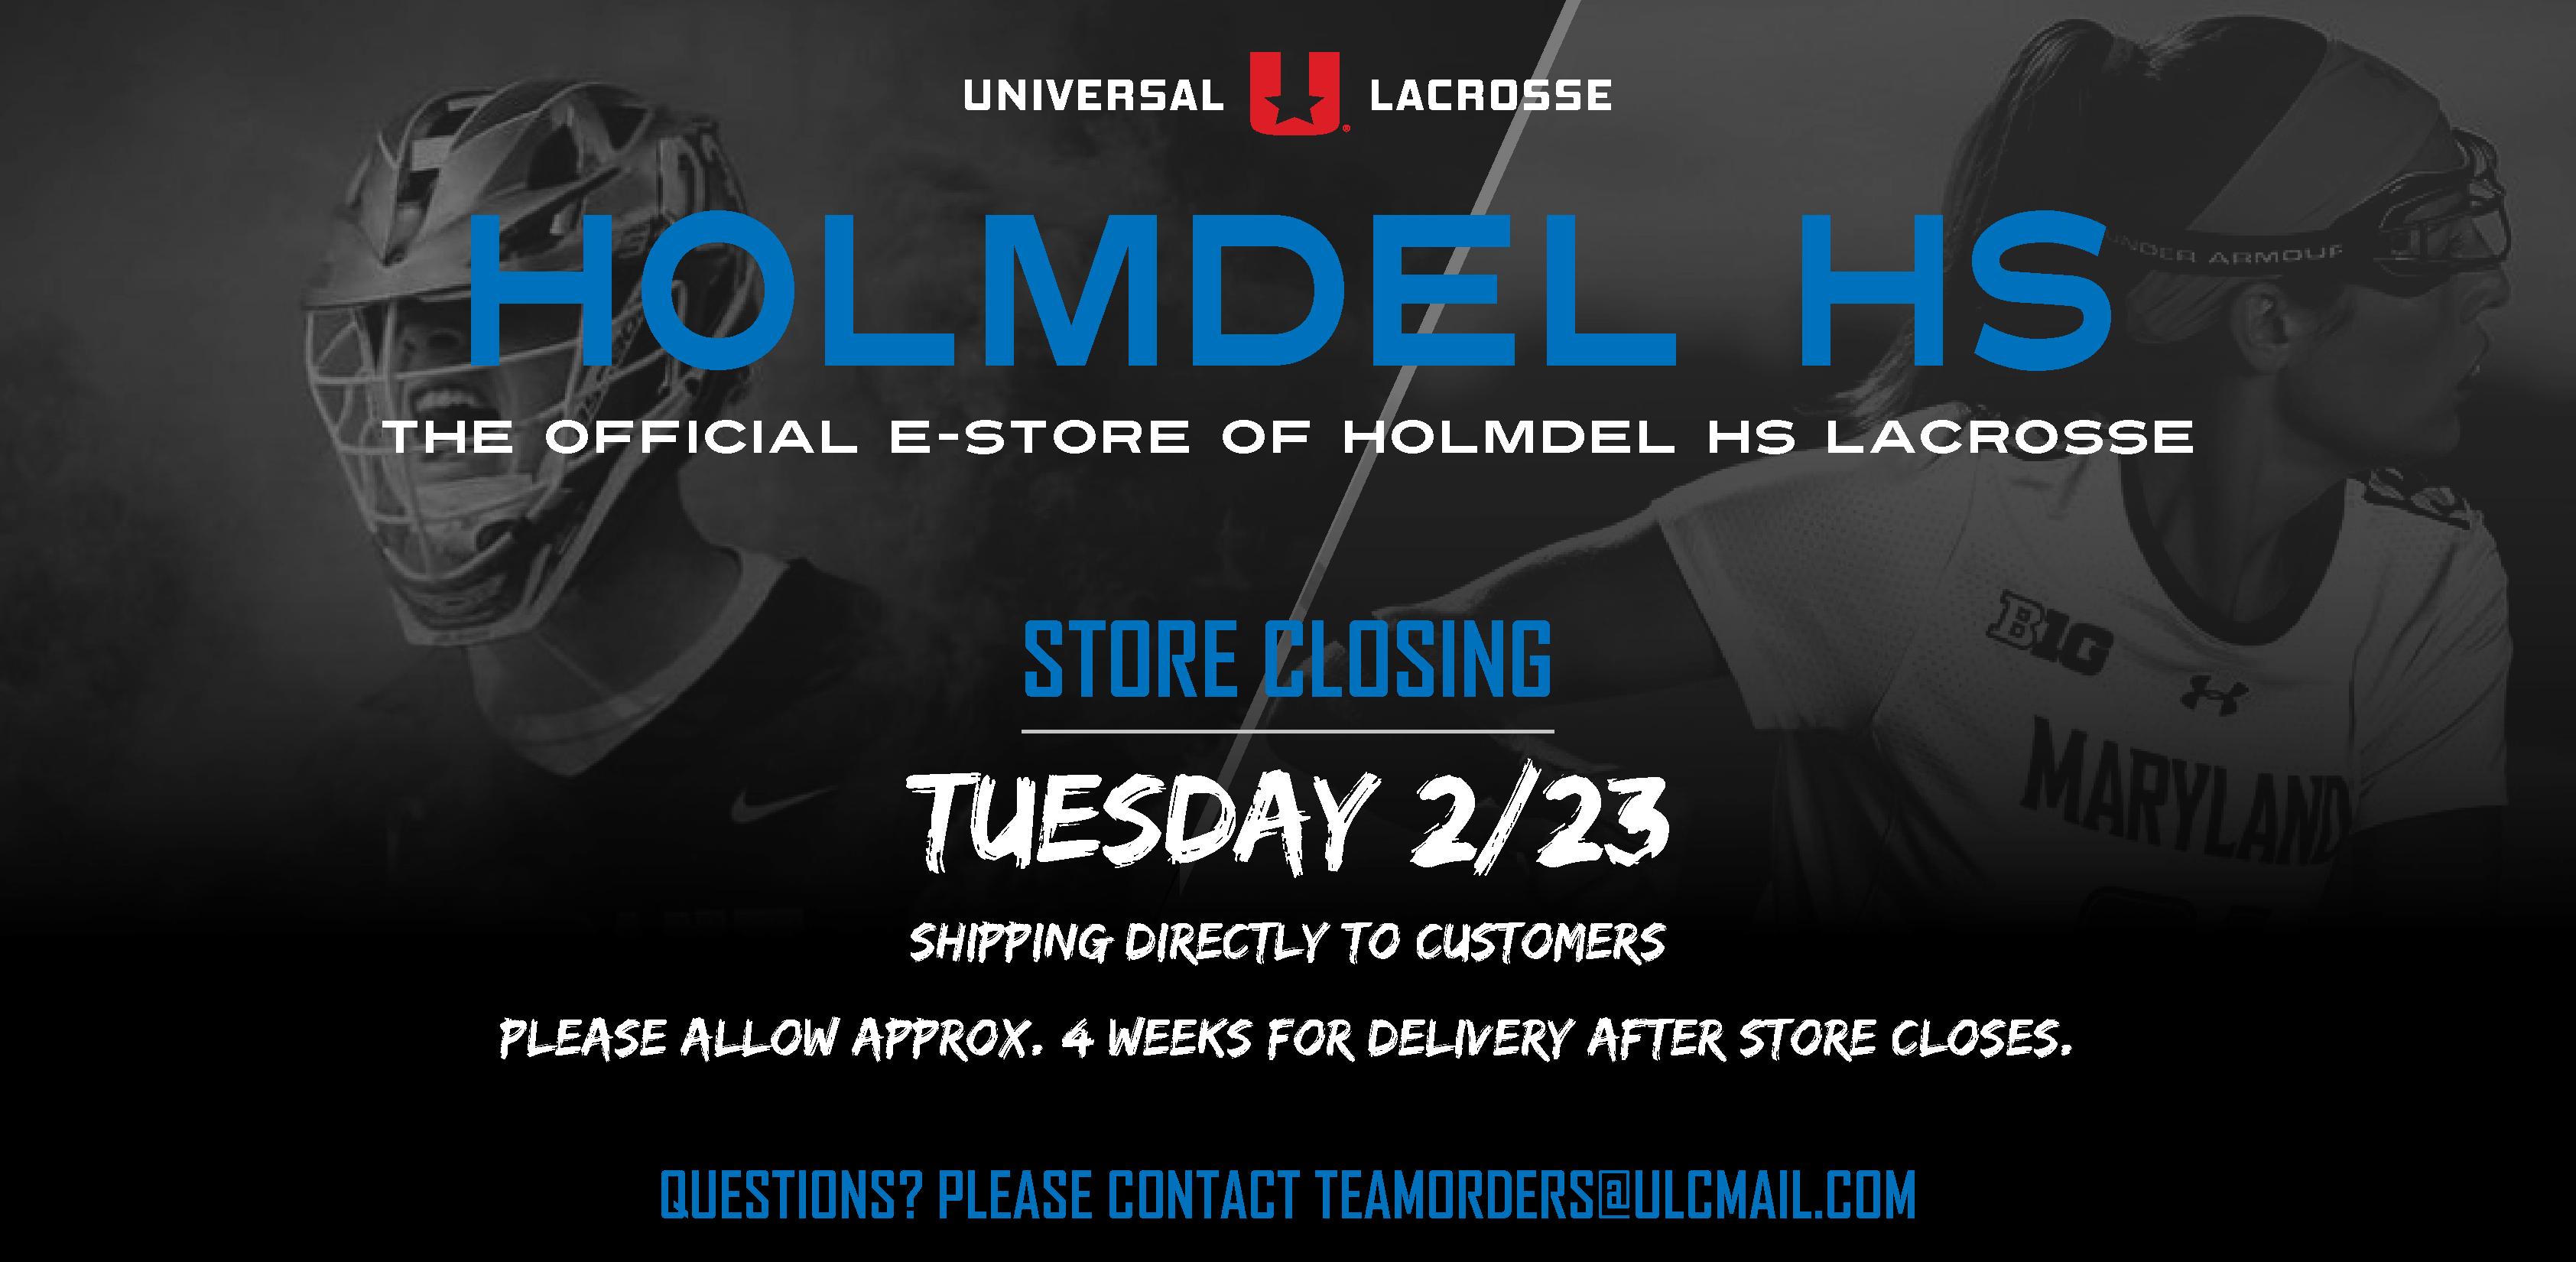 Holmdel Lacrosse